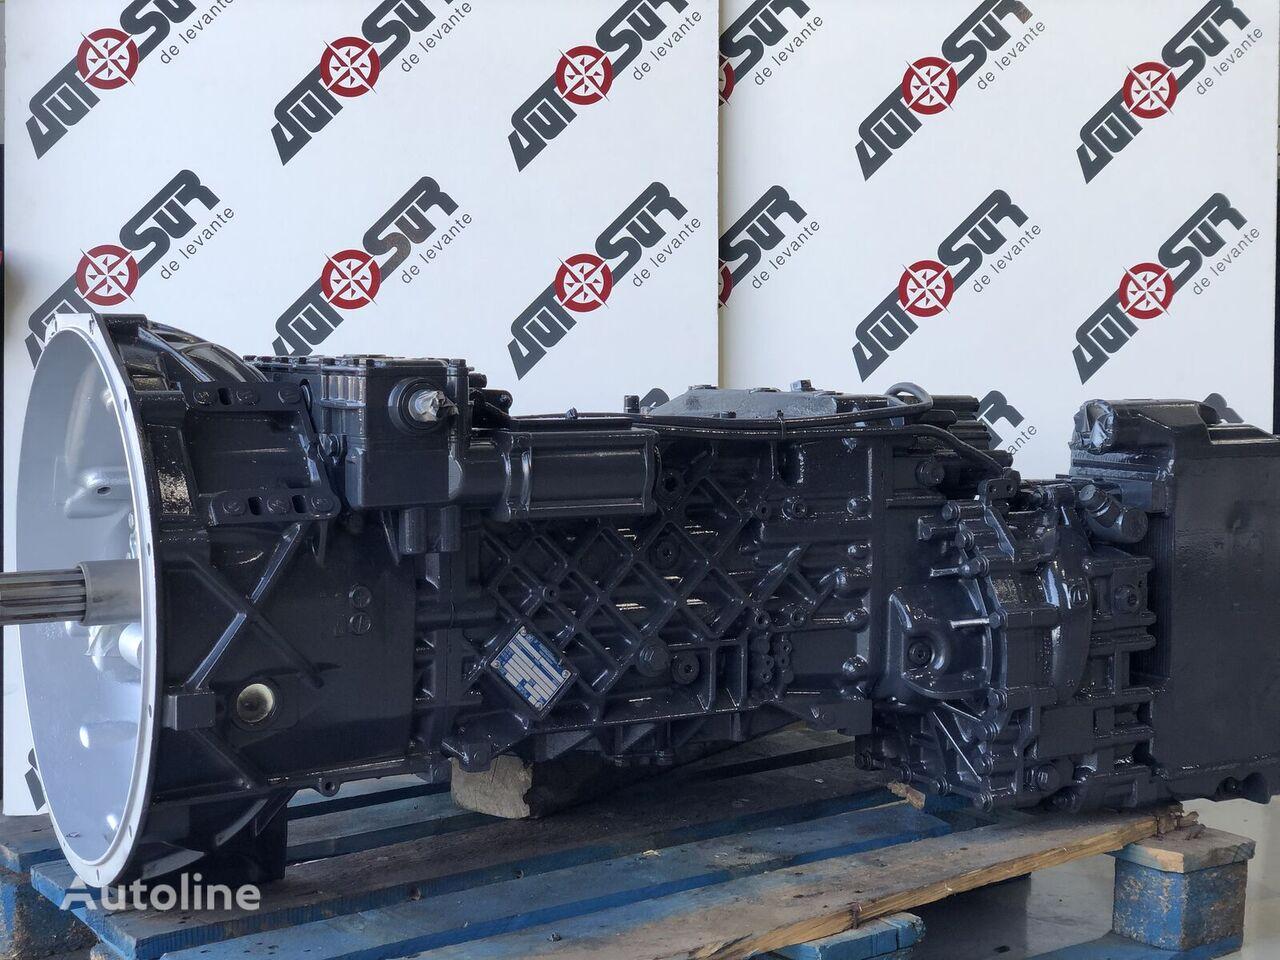 КПП ZF 16 S 2521 TO IT (81.32003-6677) для грузовика